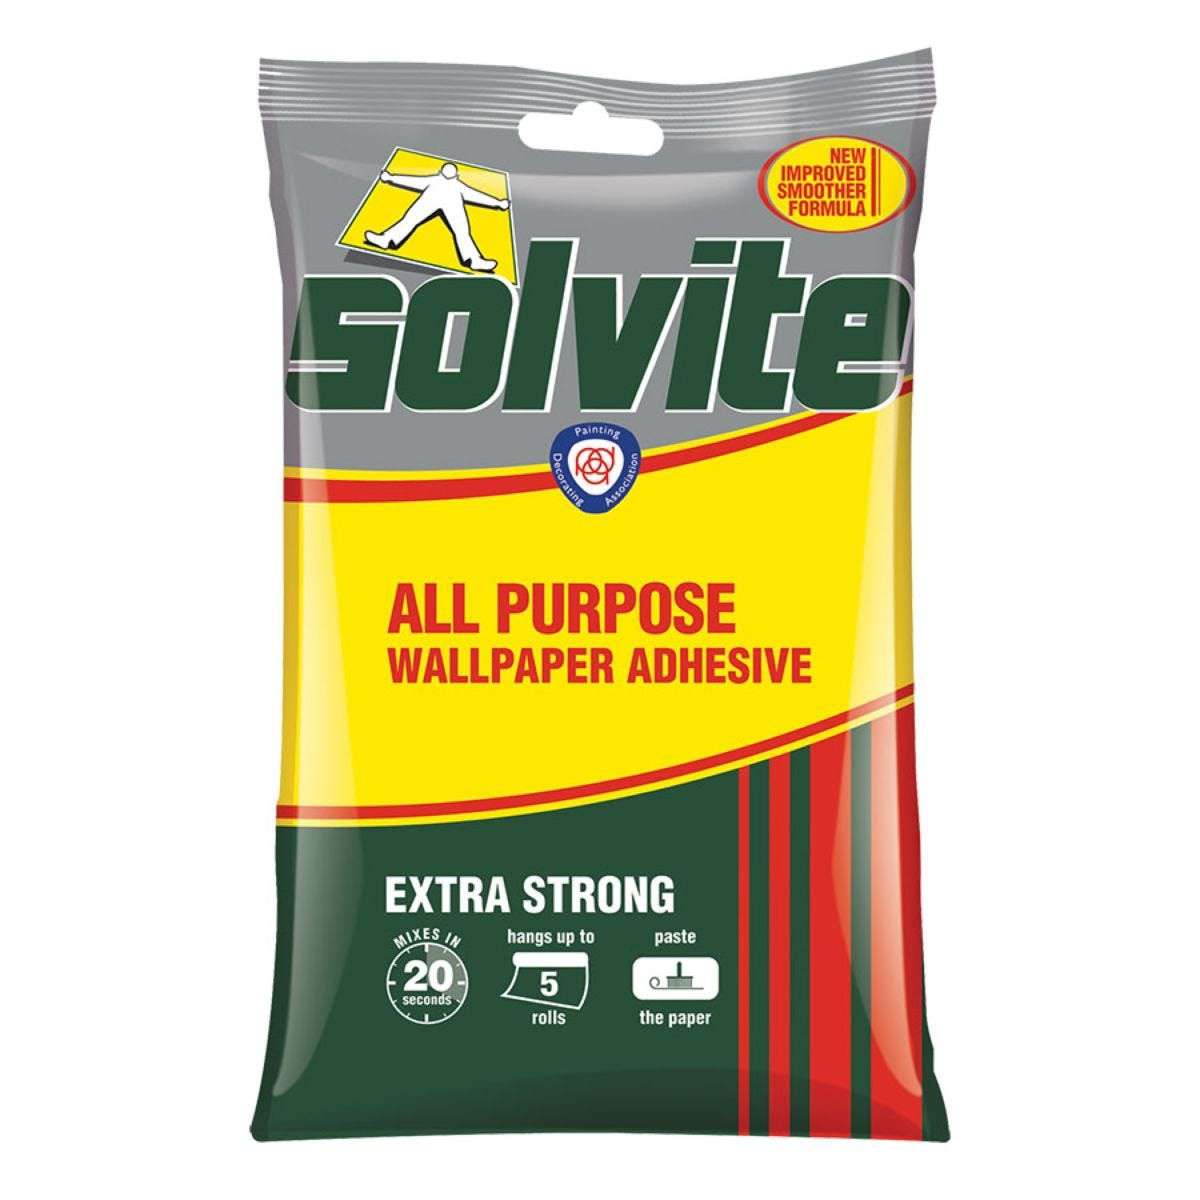 Solvite All Purpose Wallpaper Adhesive 5 Roll Flake